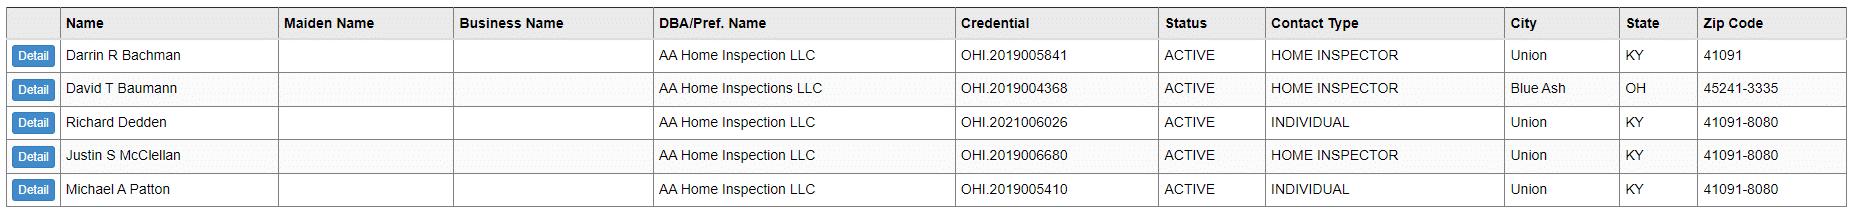 AA Home Inspectors Licensed in Ohio